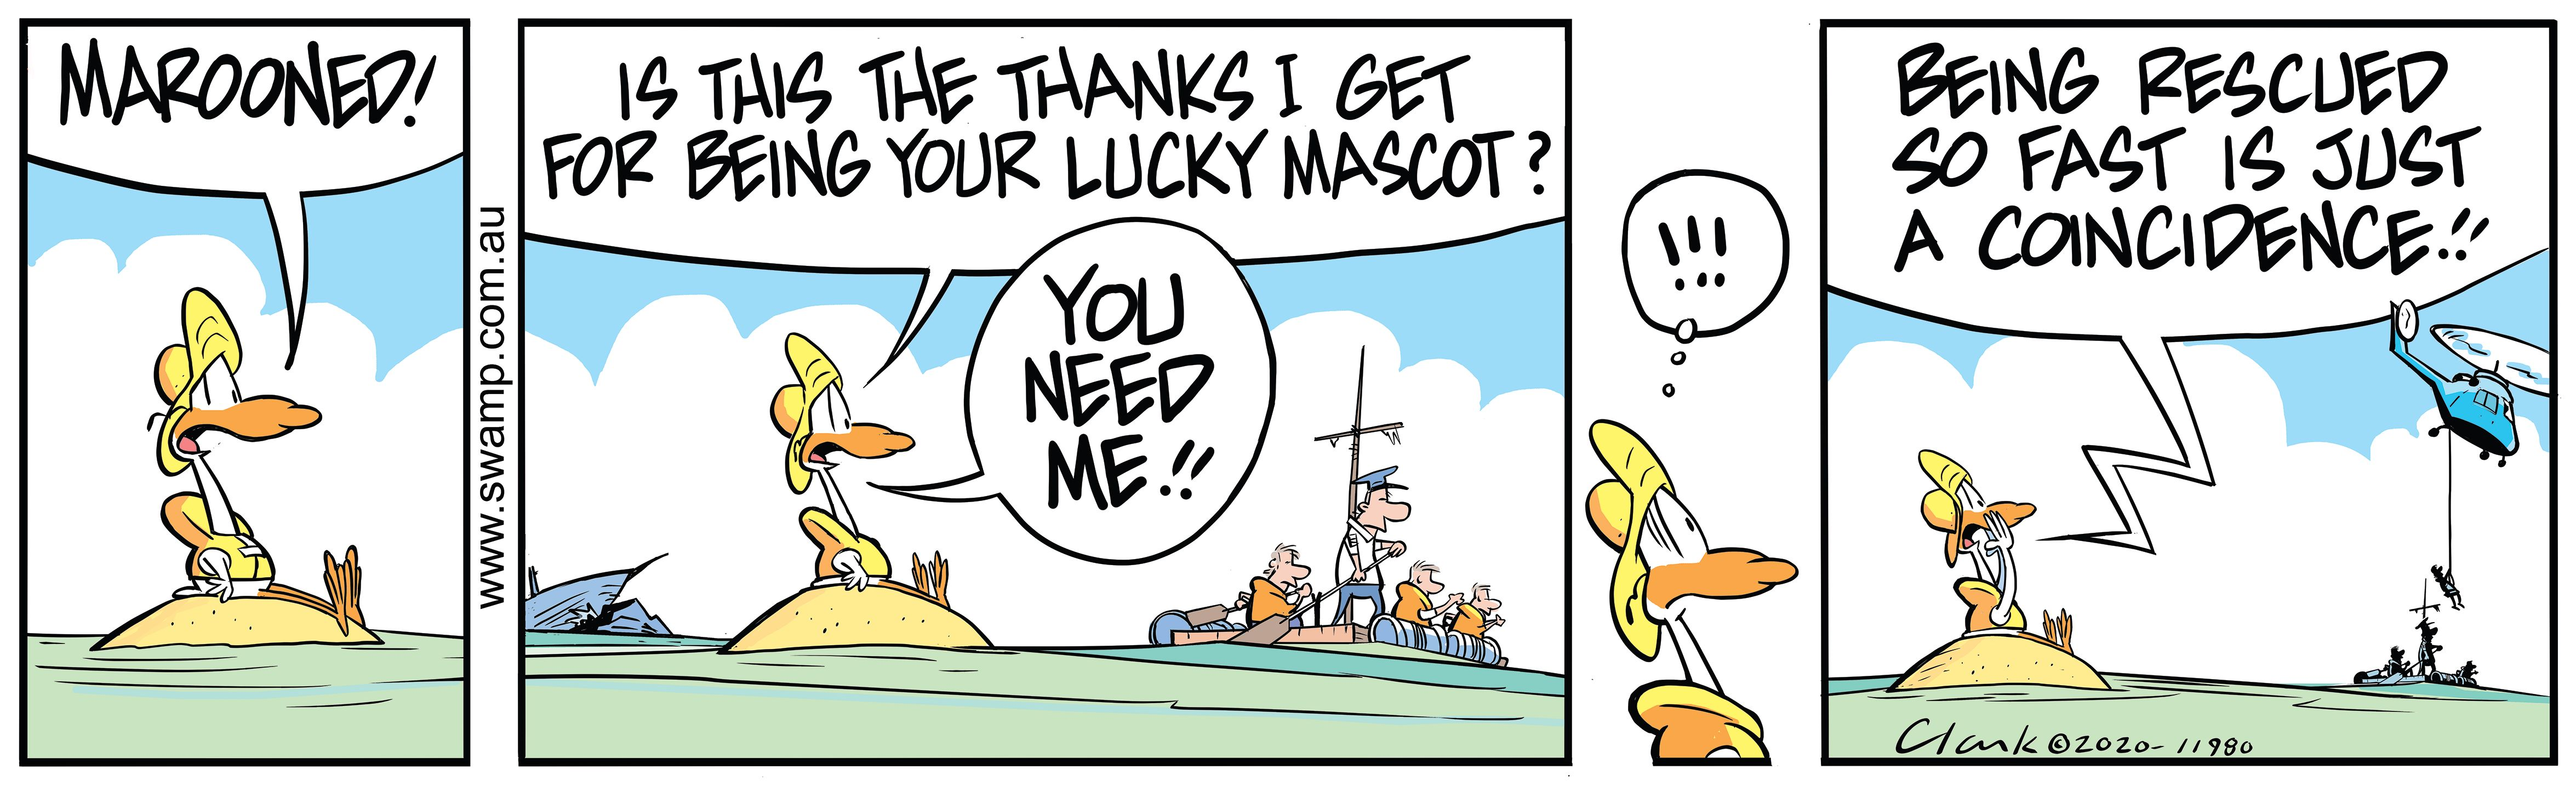 Lucky Mascot Marooned